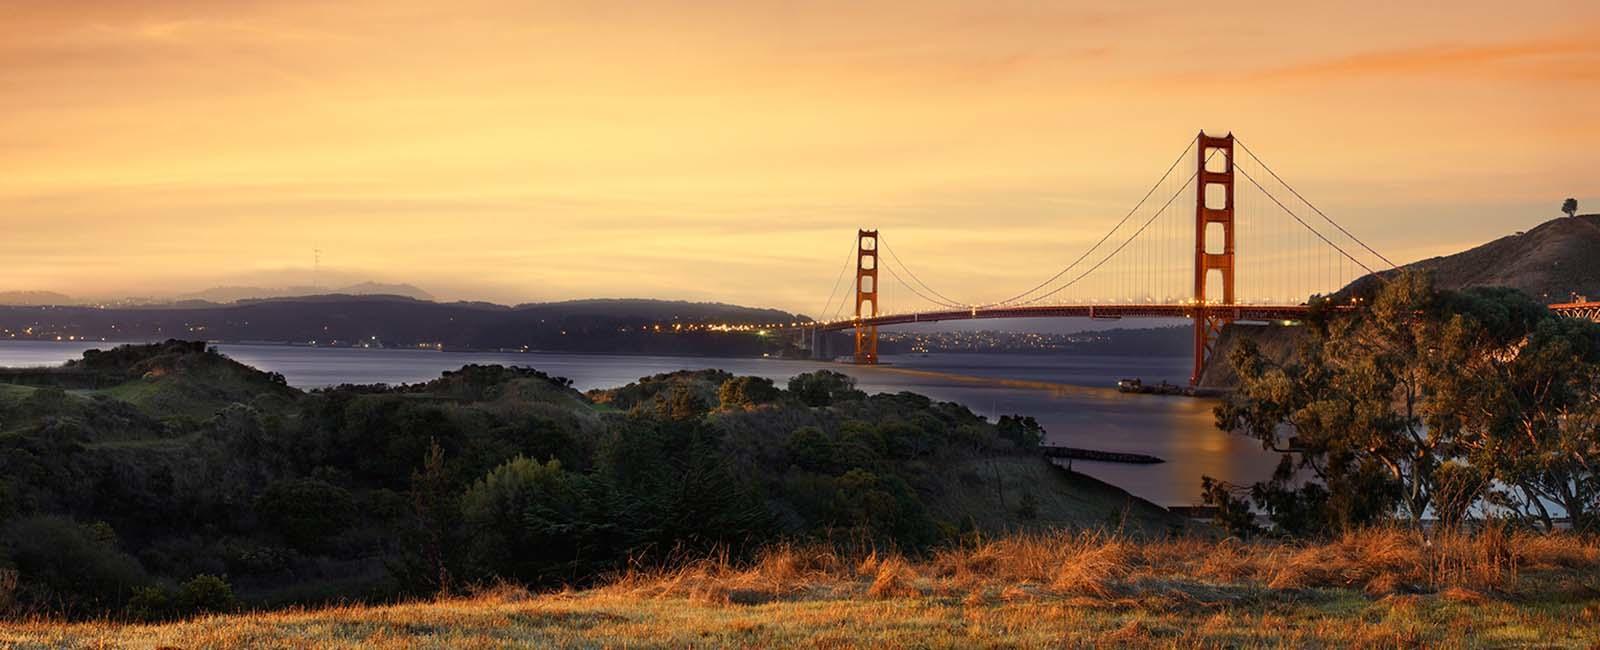 The Golden Gate Bridge seen from Fort Baker.